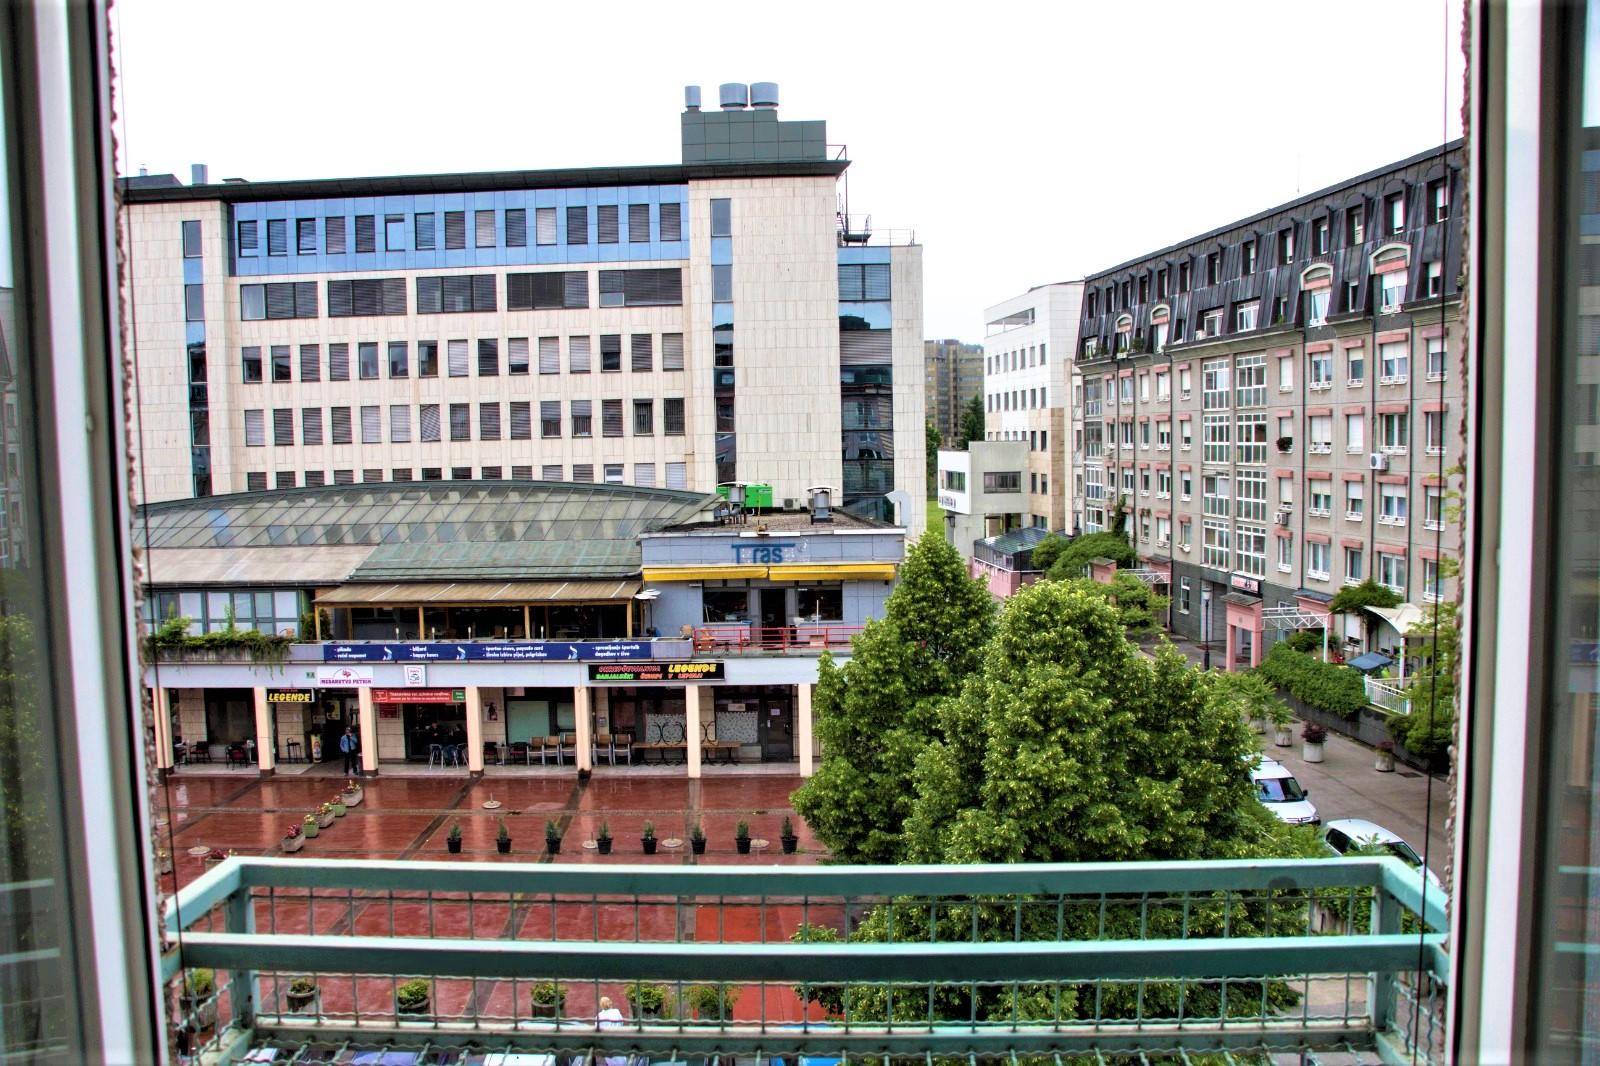 Pogled na ulico - stanovanje Ljubljana Zupančičeva Jama